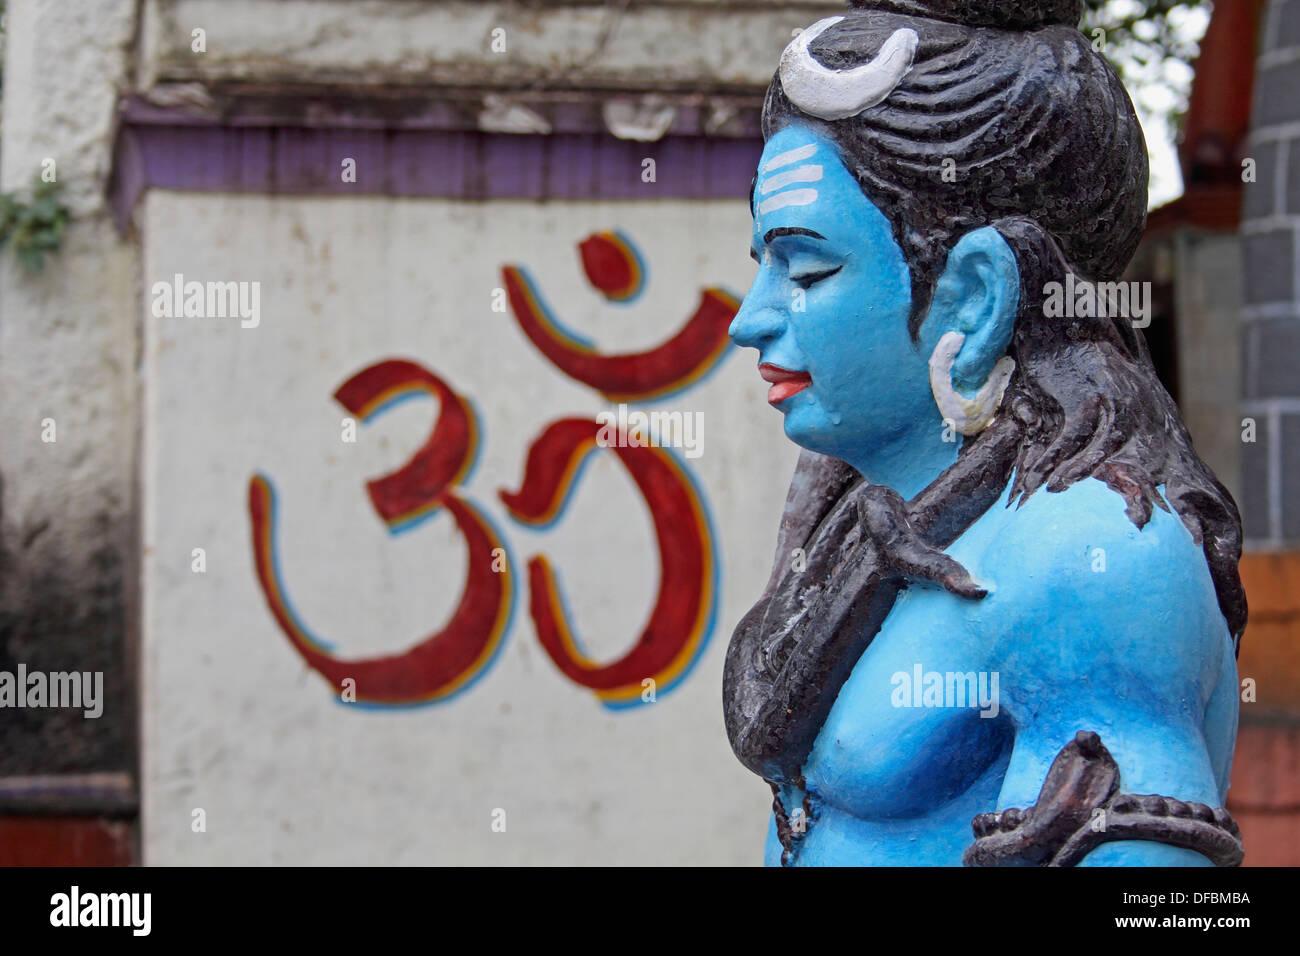 The Holy, Ancient Lord Shiva Temple, Siddheshwar Temple, Rajgurunagar, Khed - Stock Image